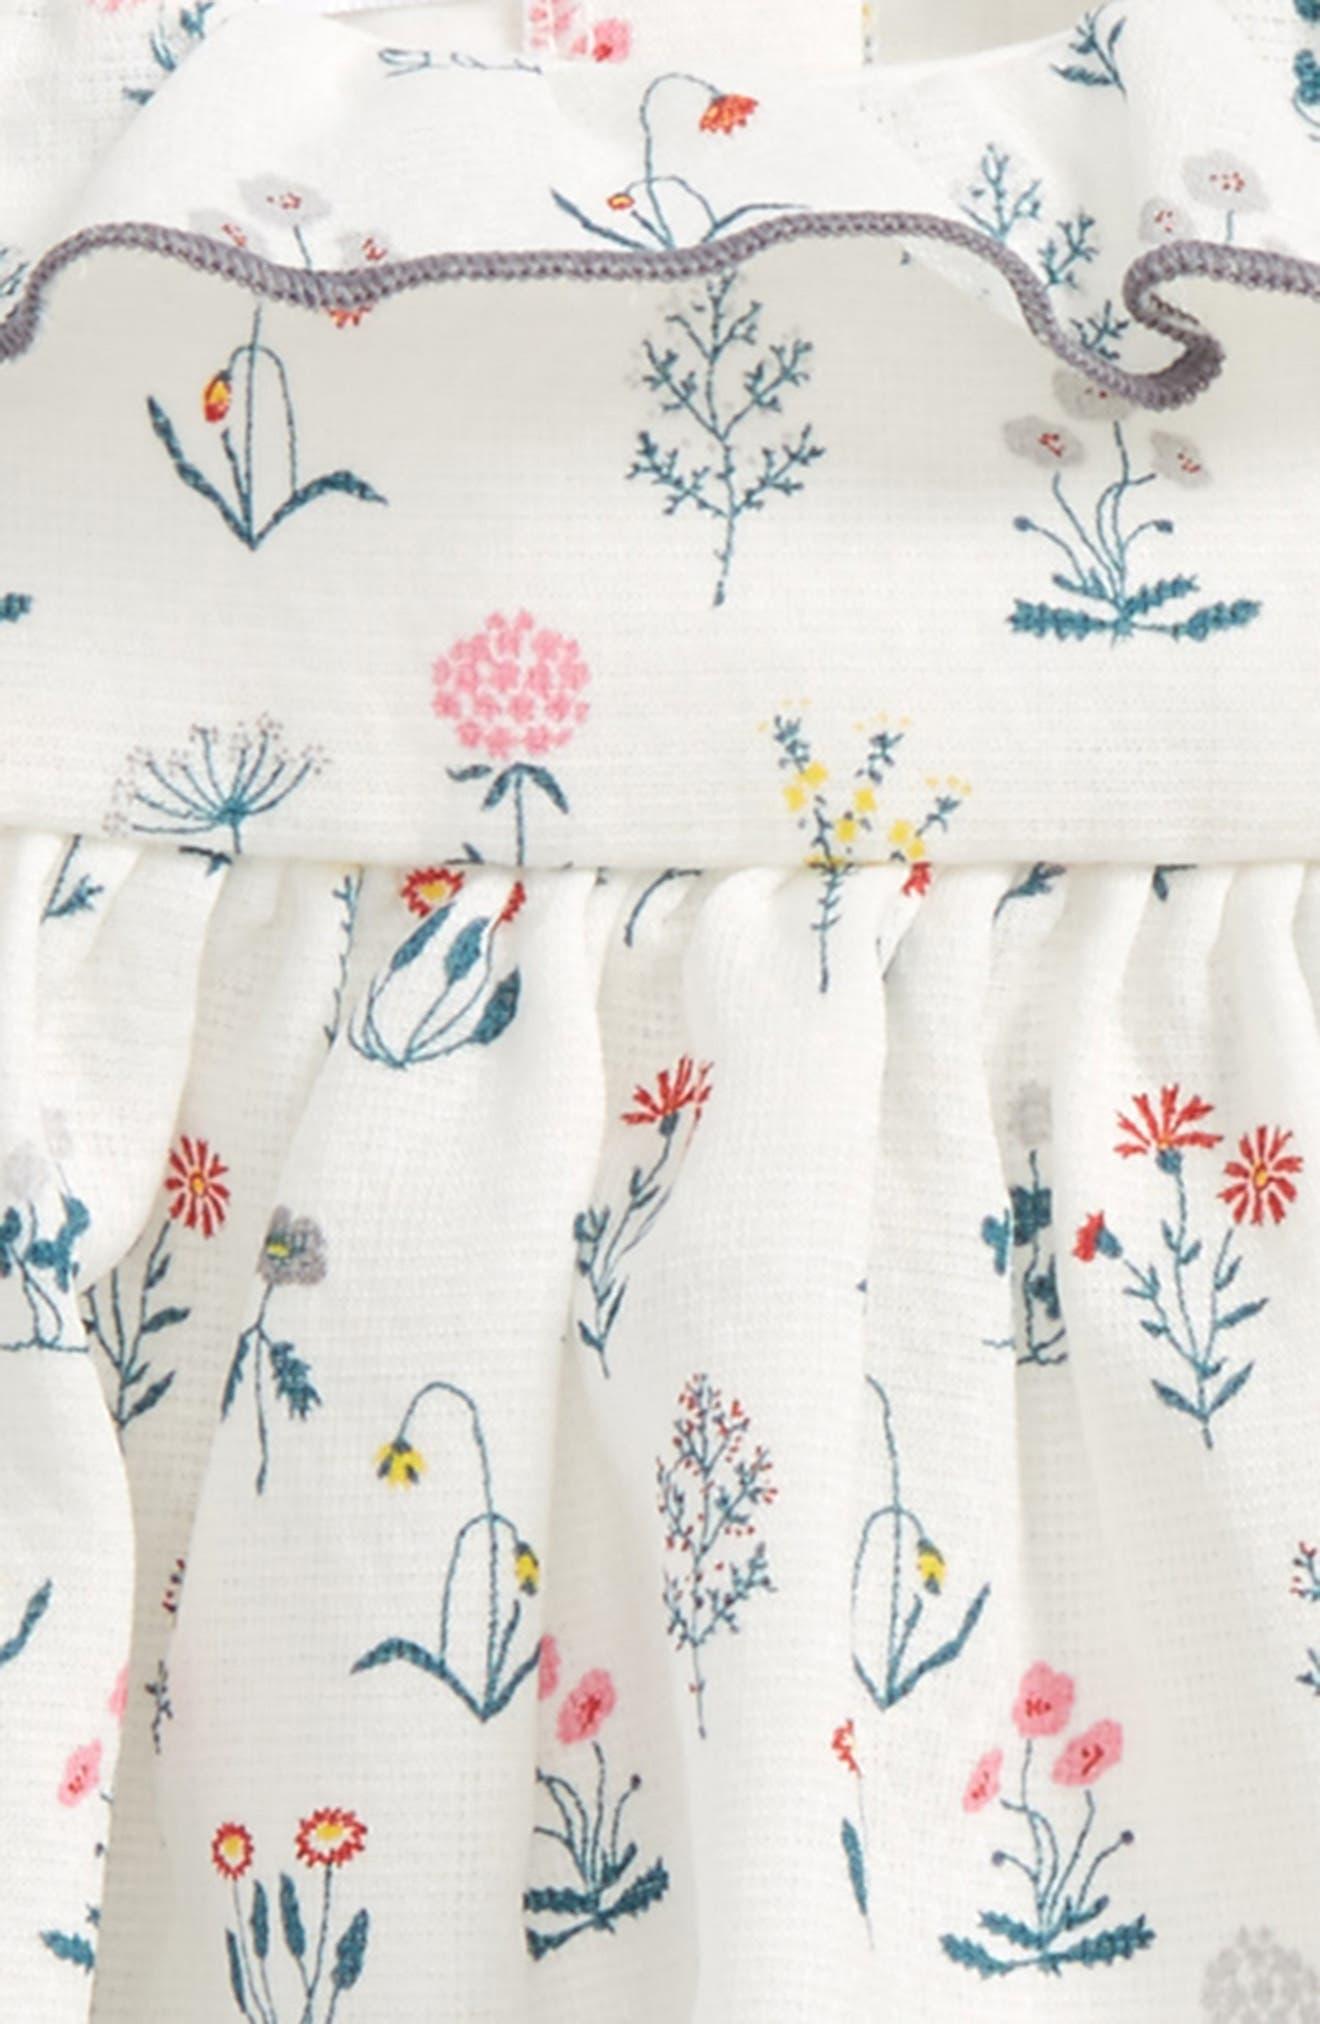 Floral Print Dress & Leggings Set,                             Alternate thumbnail 2, color,                             White/ Grey